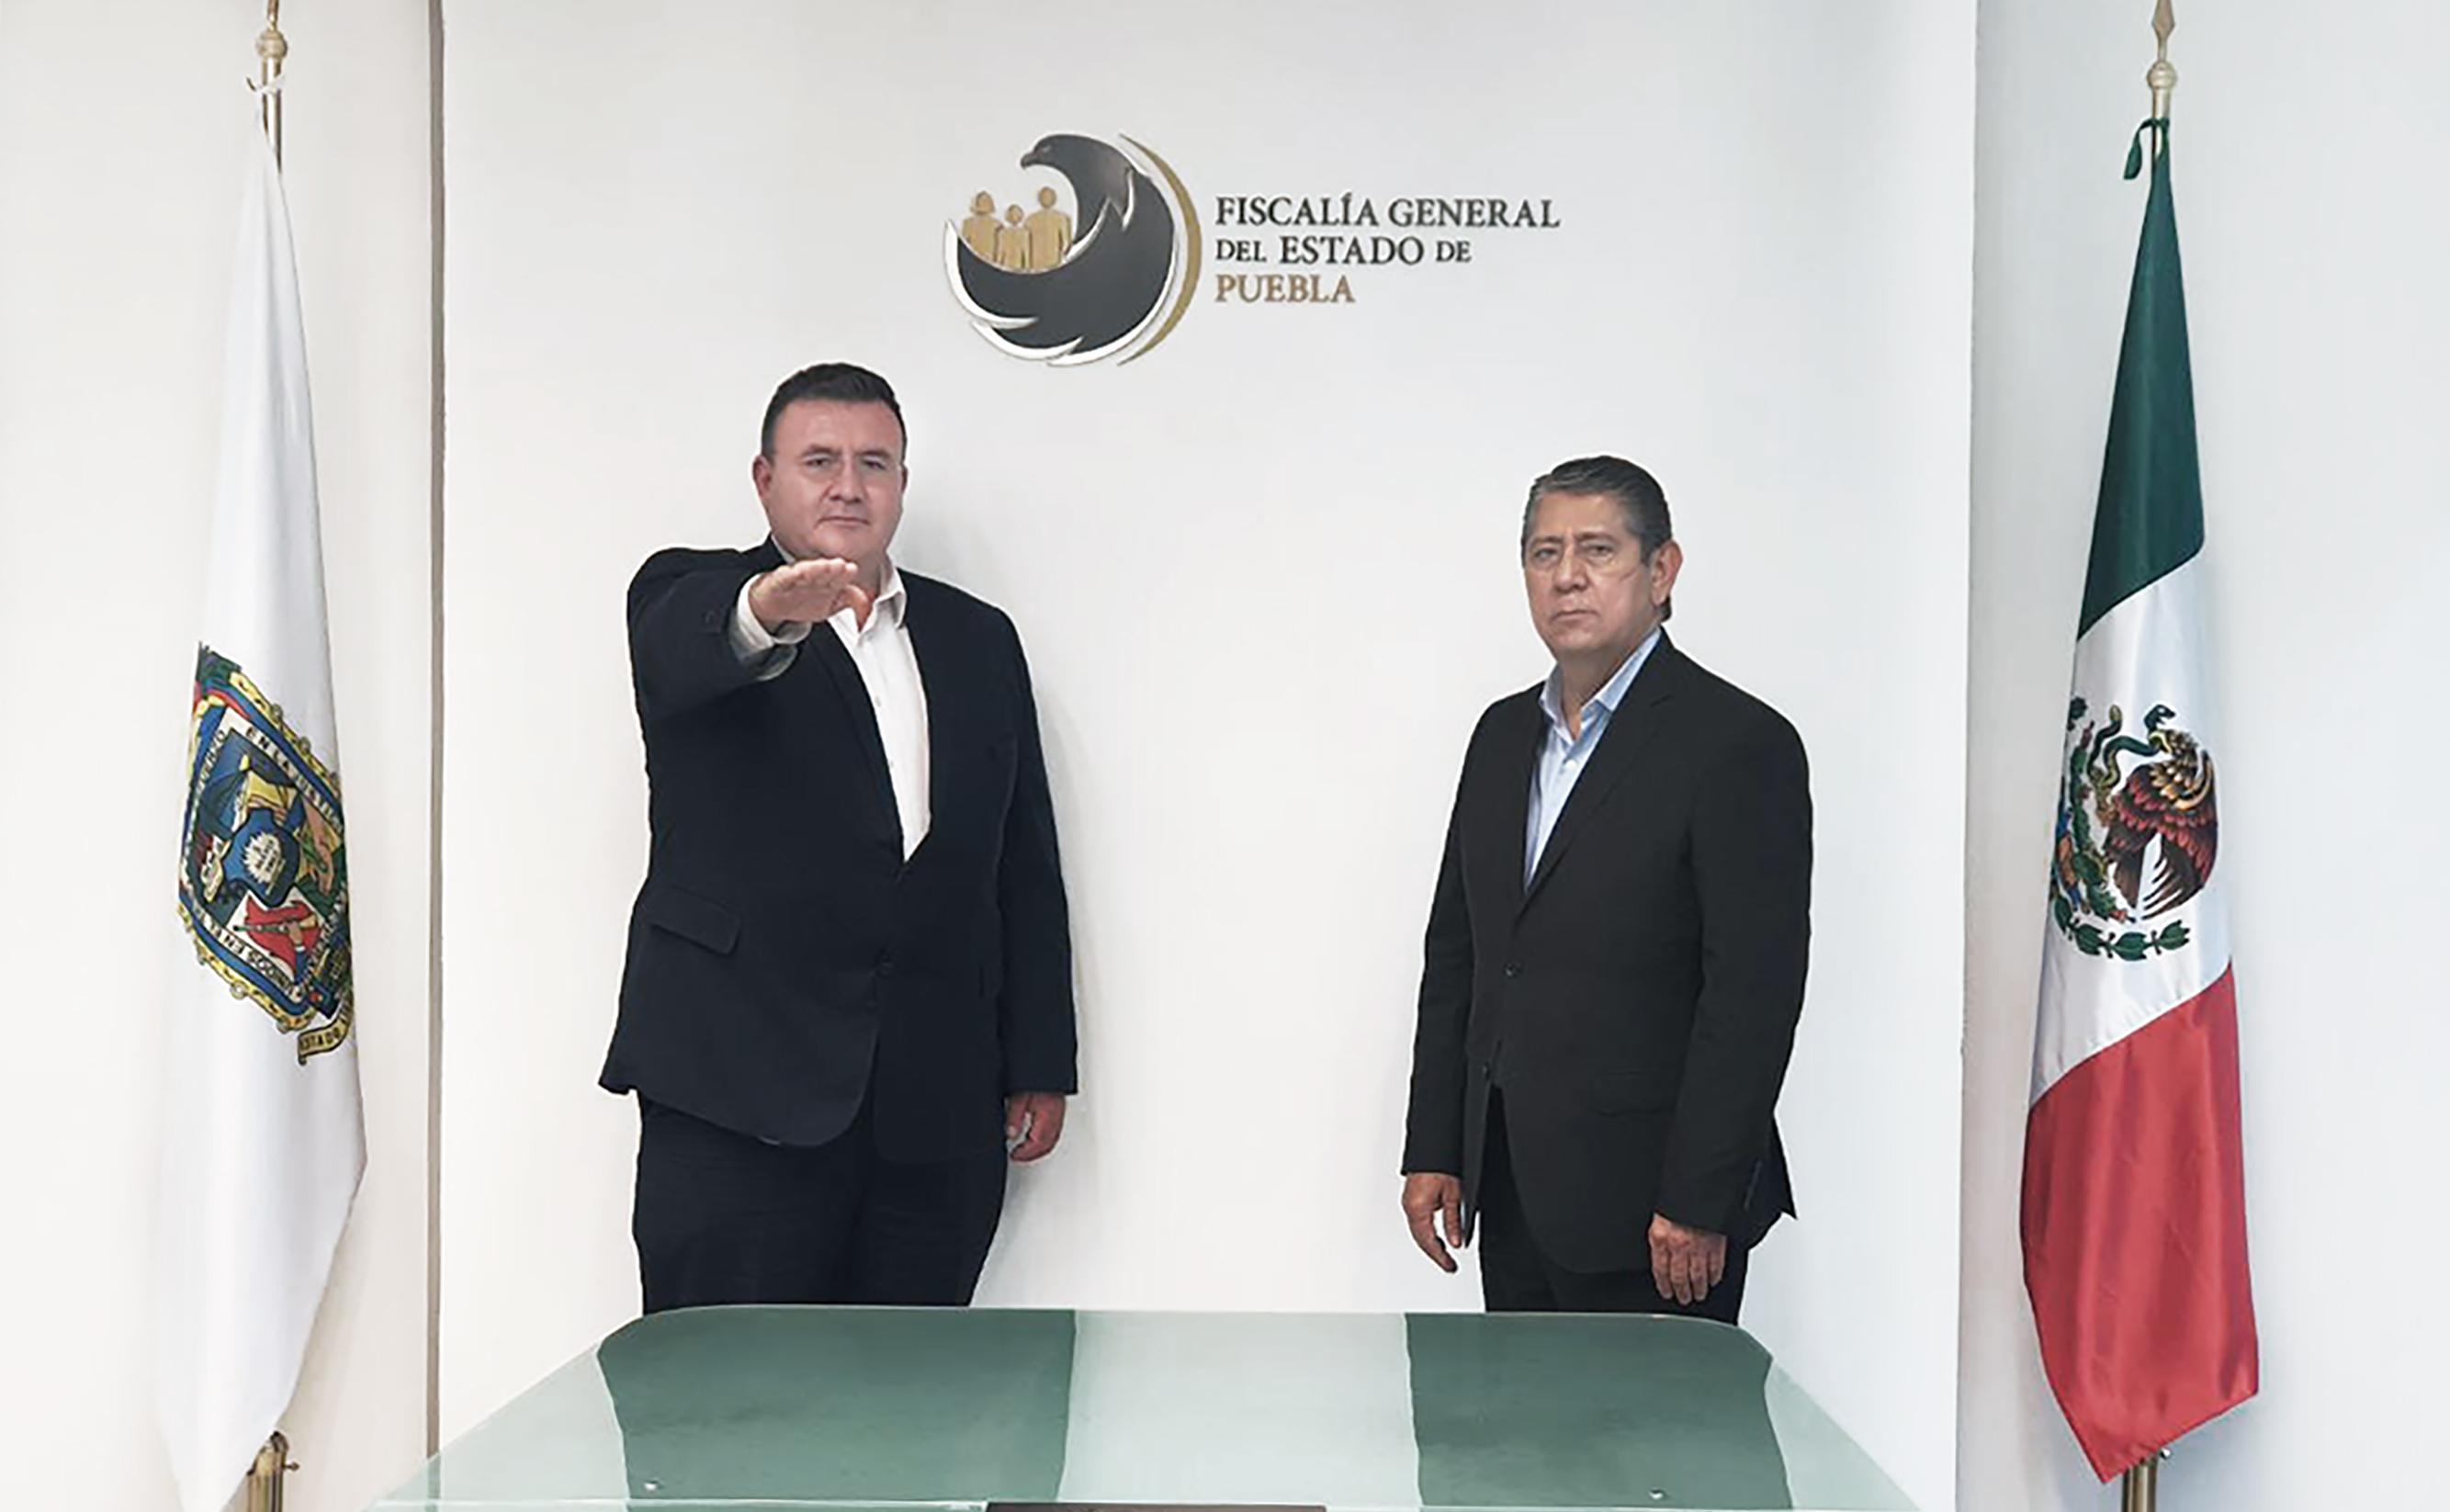 Designa el Fiscal General de Puebla a fiscales especializados